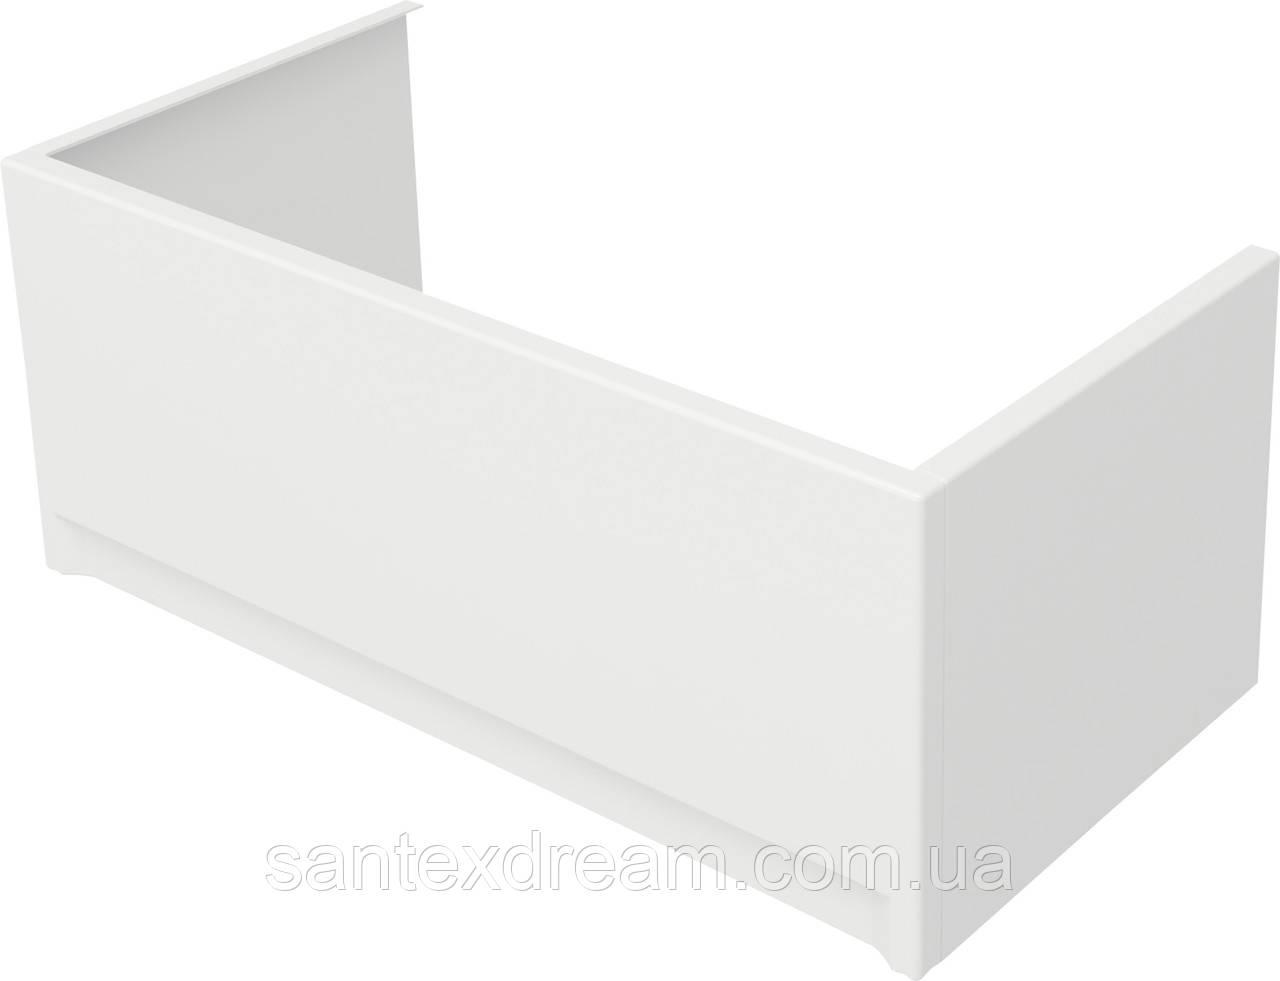 Панель Cersanit Lorena/Flawia/Octavia 150